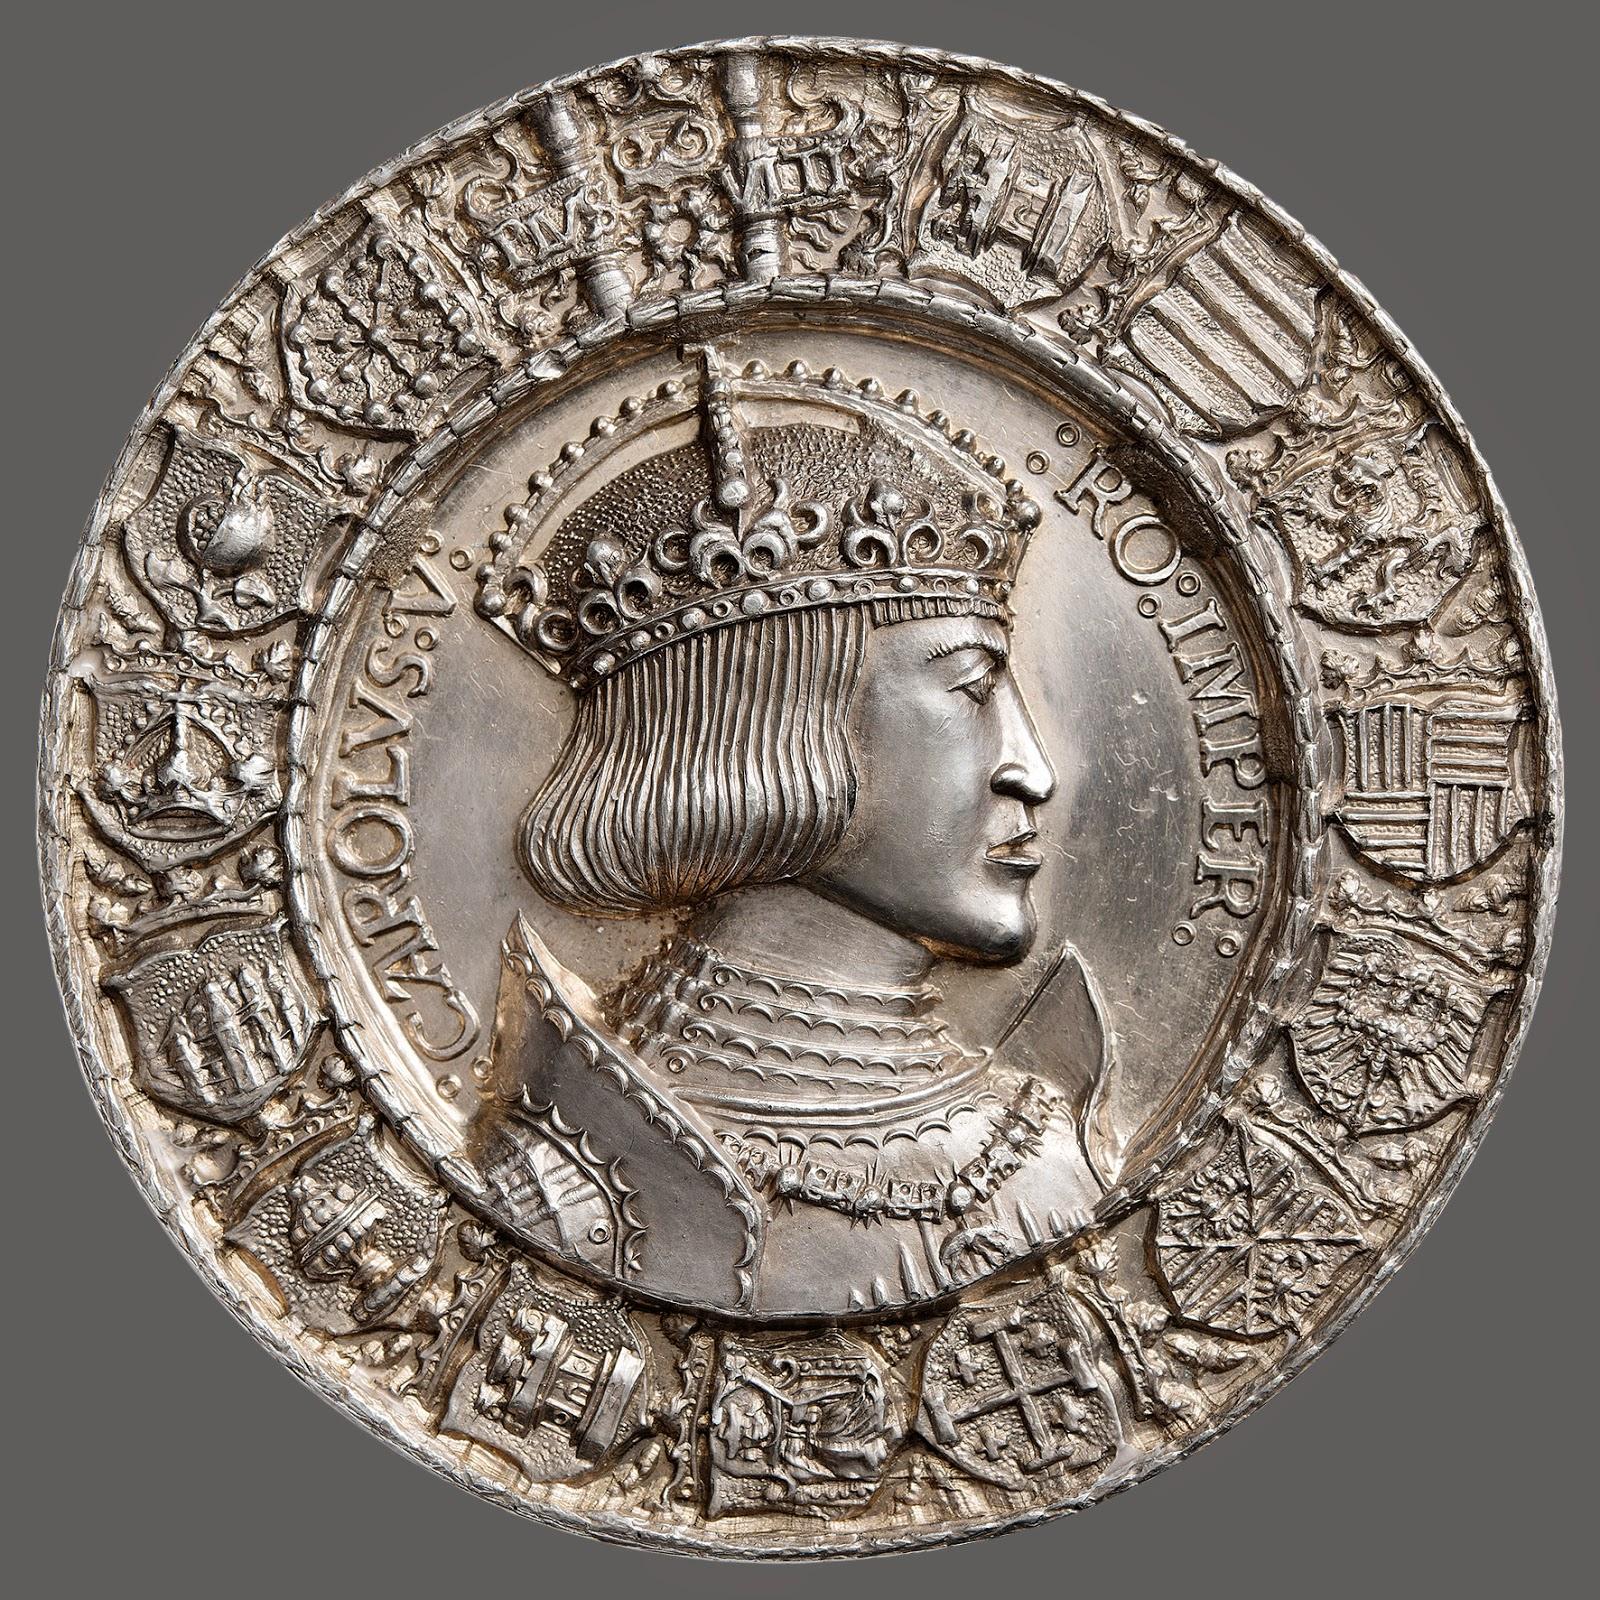 Medal of Charles V, designed by Albrecht Dürer, 1519